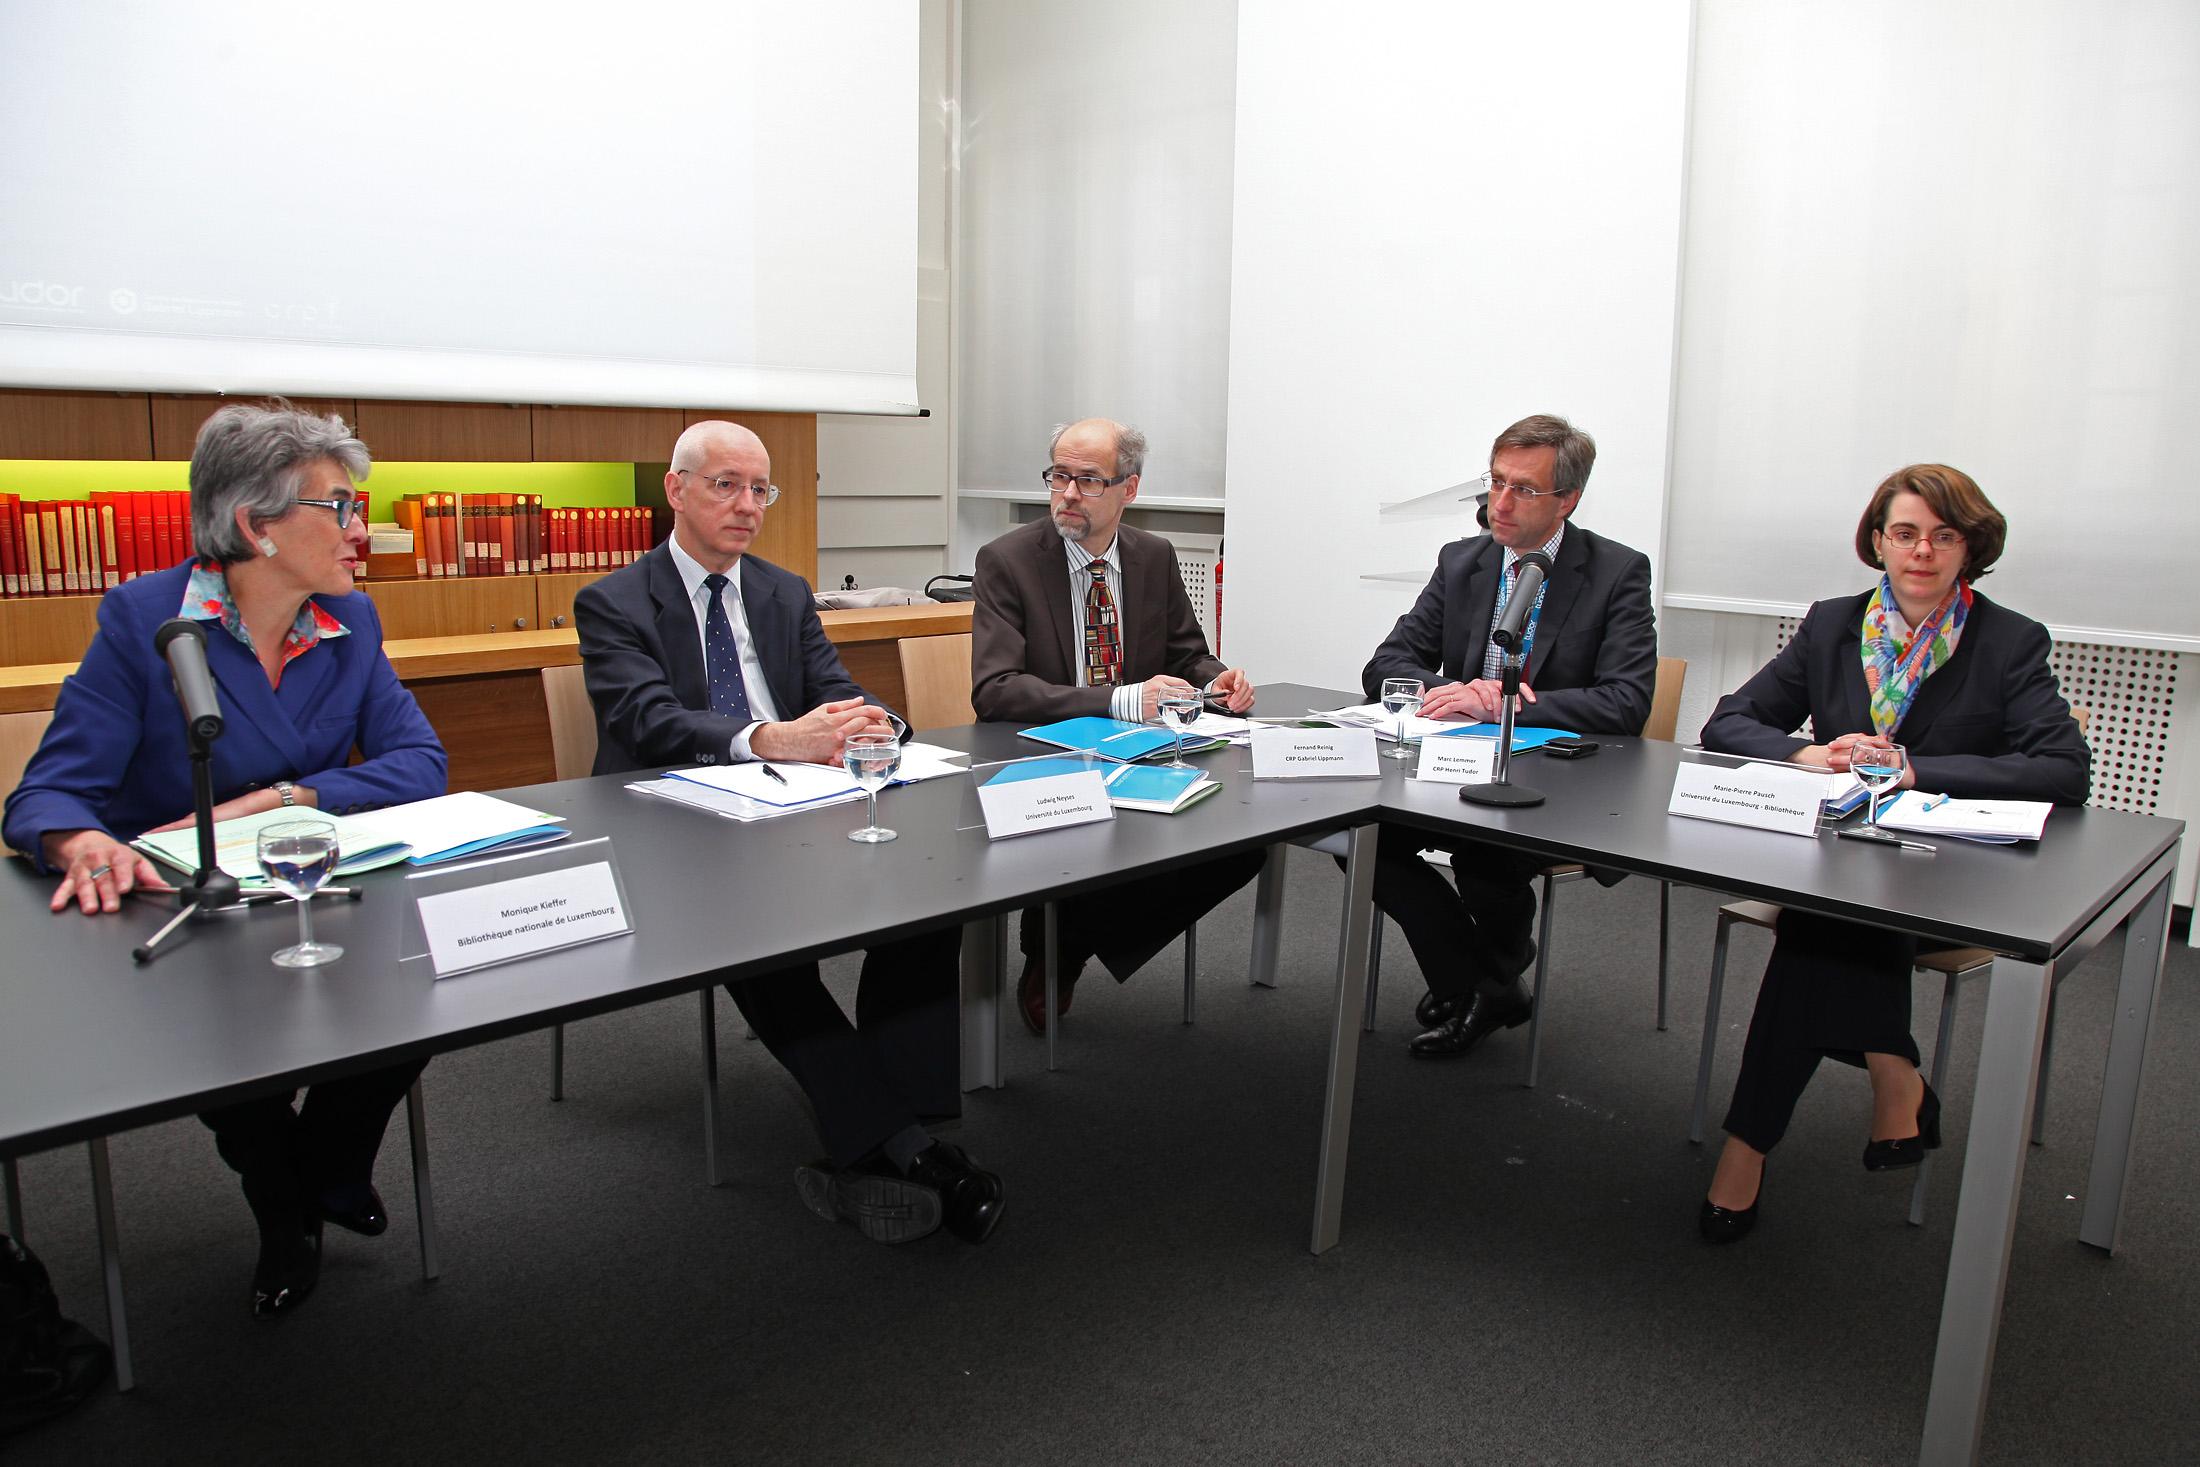 Monique Kieffer (BnL), Dr. Ludwig Neyses (Université), Fernand Reinig (CRP G. Lippmann), Marc Lemmer (CRP H. Tudor), Marie-Pierre Pausch (Université)